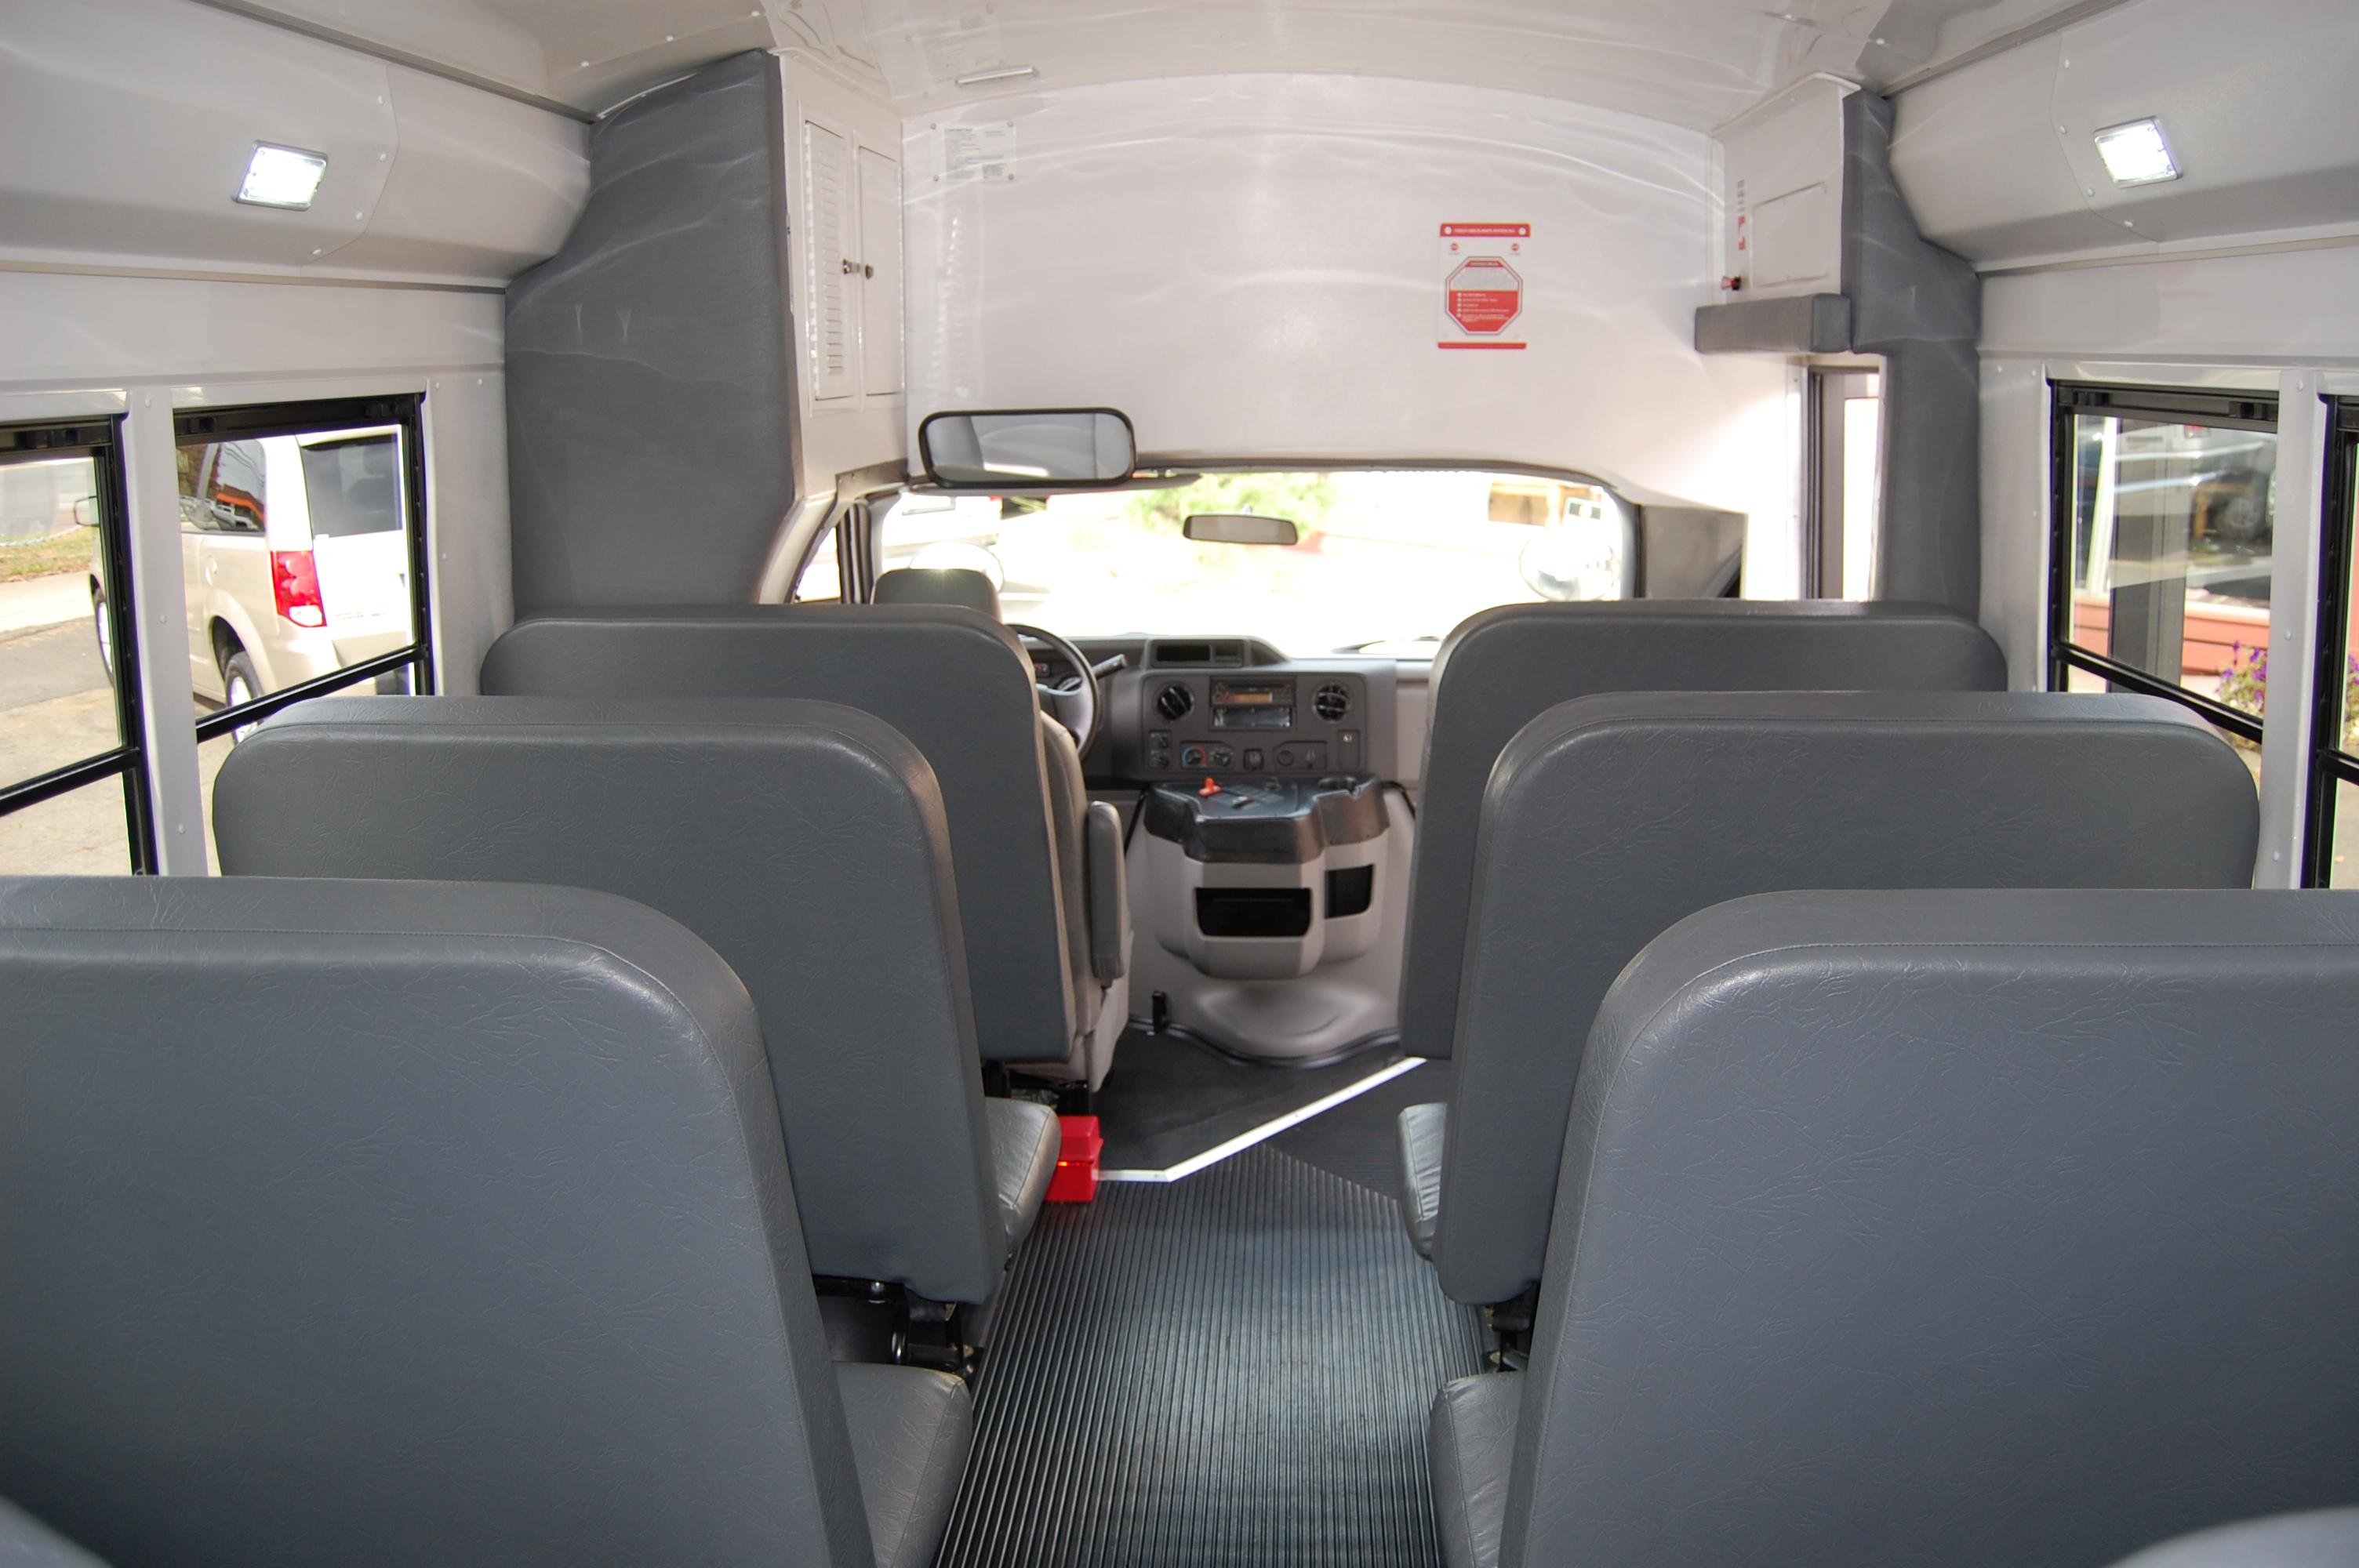 15 Passenger Activity Bus